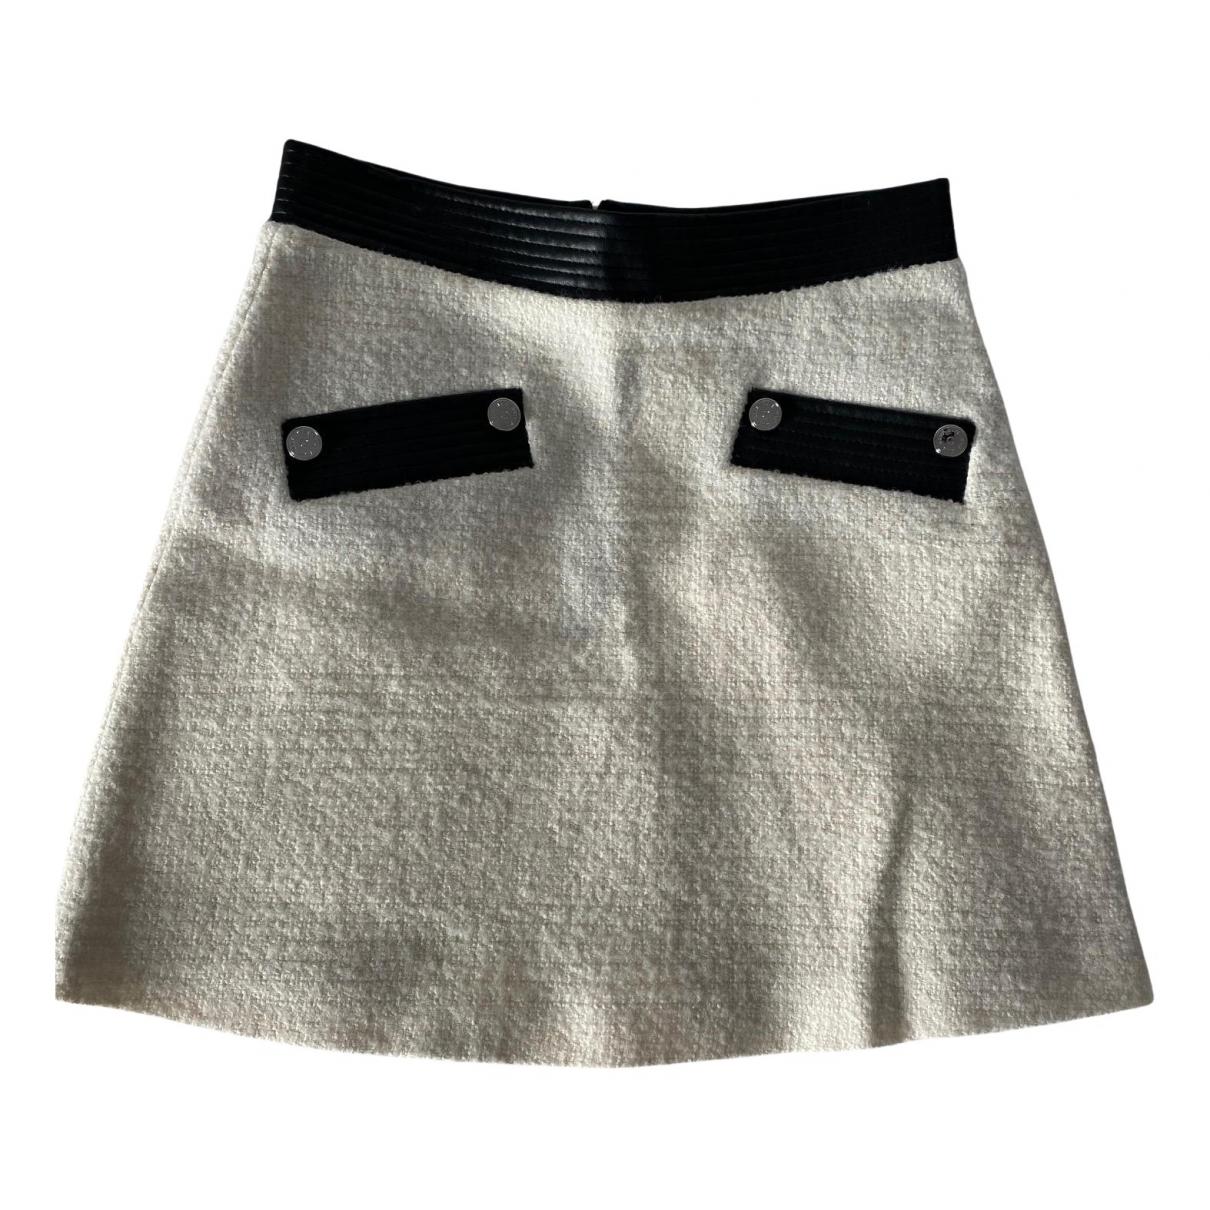 Maje Fall Winter 2019 Ecru Wool skirt for Women 38 FR